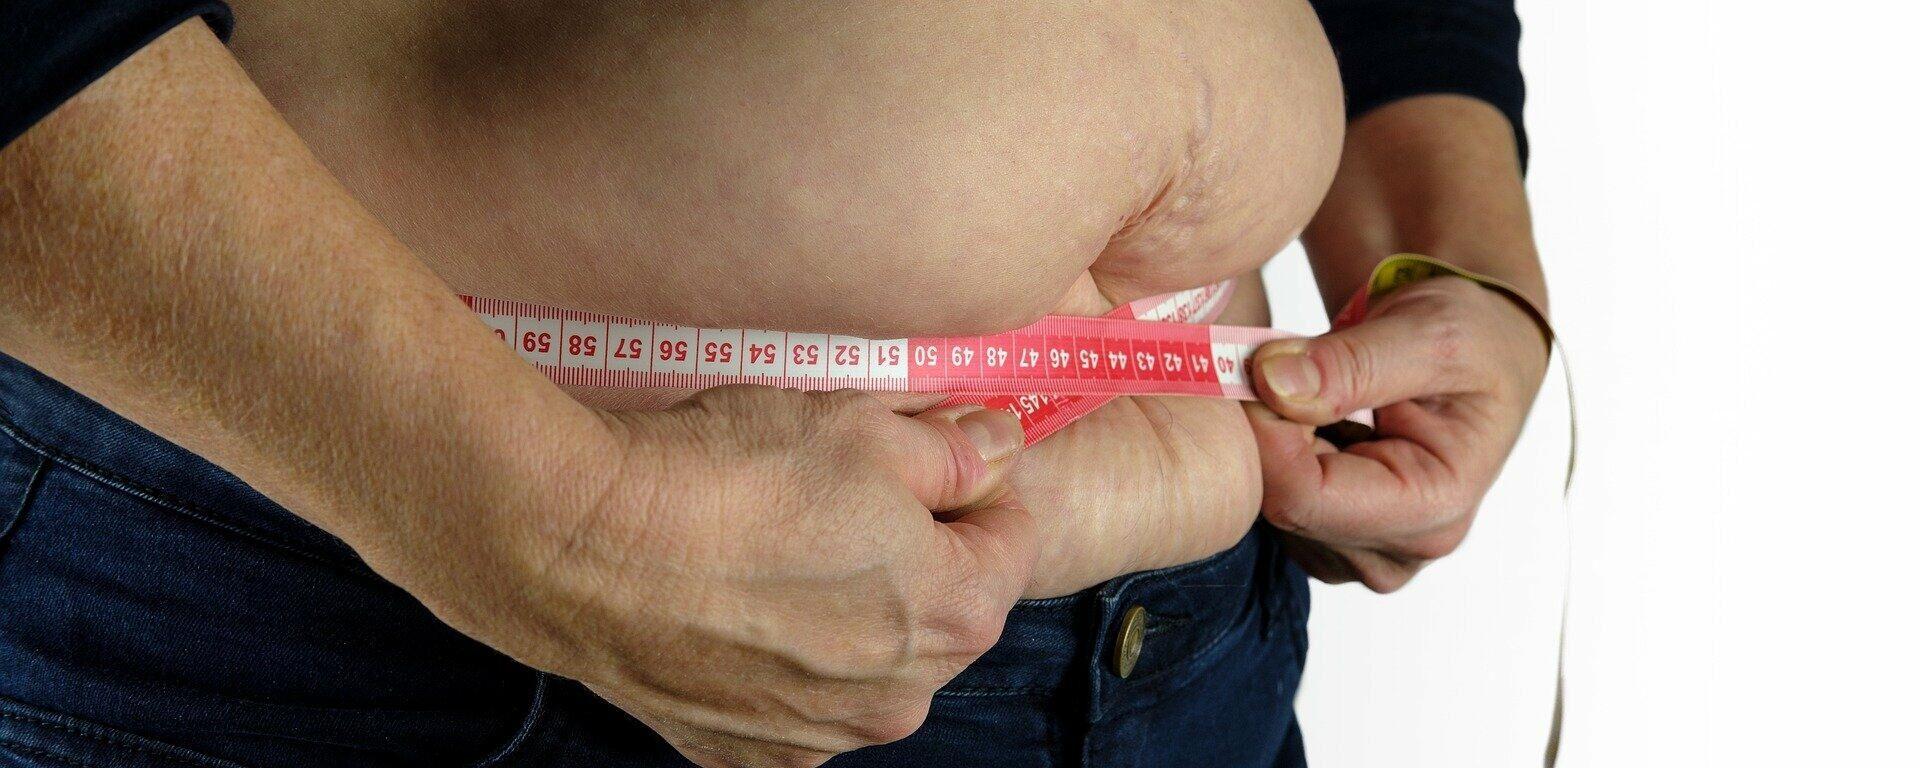 Una persona midiéndose la cintura - Sputnik Mundo, 1920, 04.09.2021